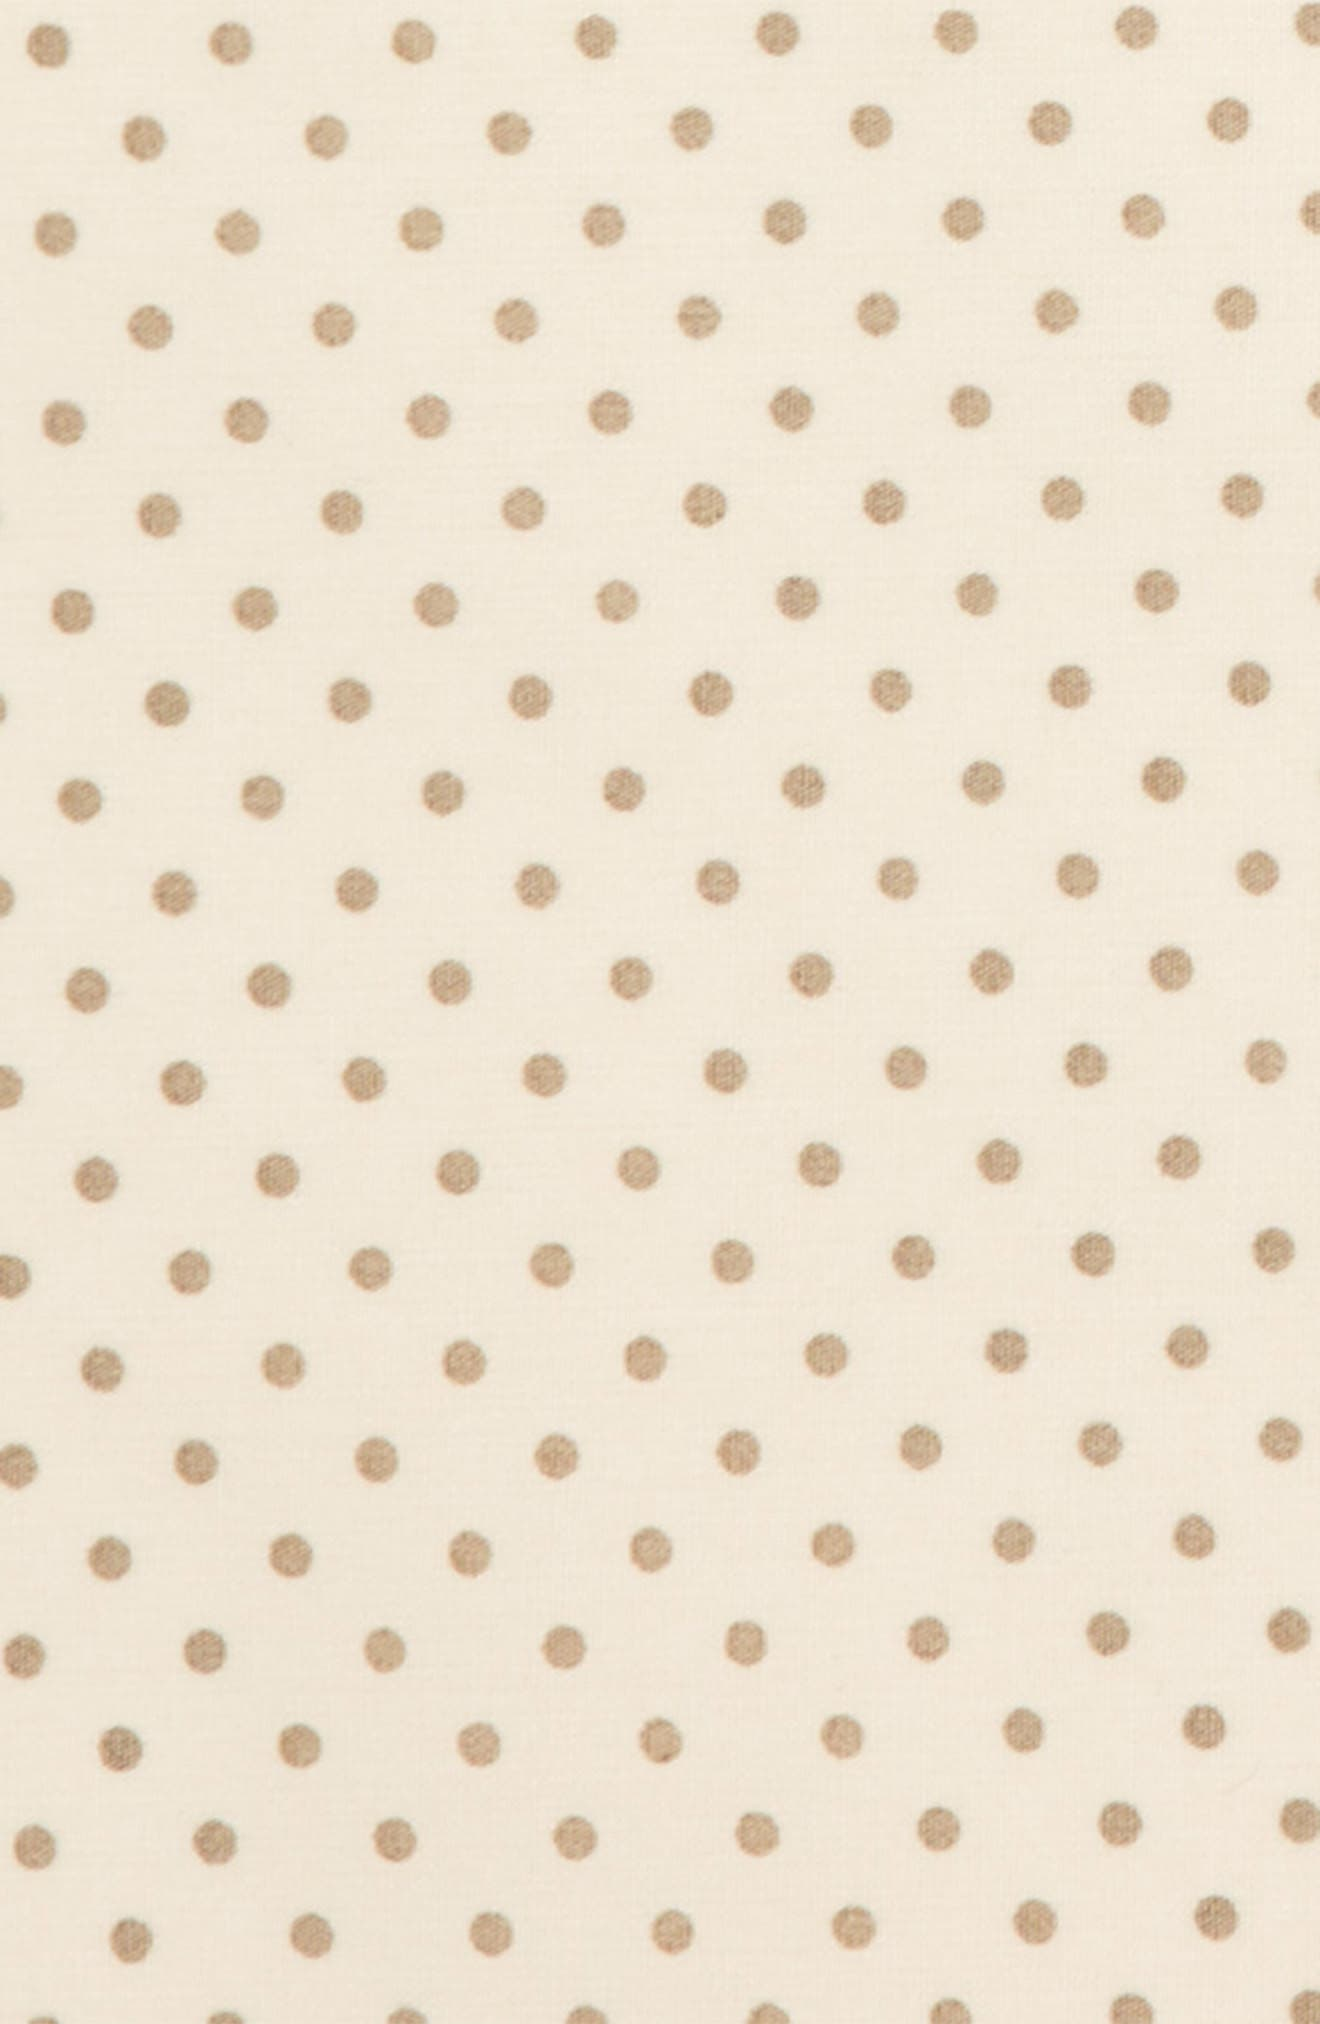 Dot Cotton Pocket Square,                             Alternate thumbnail 3, color,                             Cream